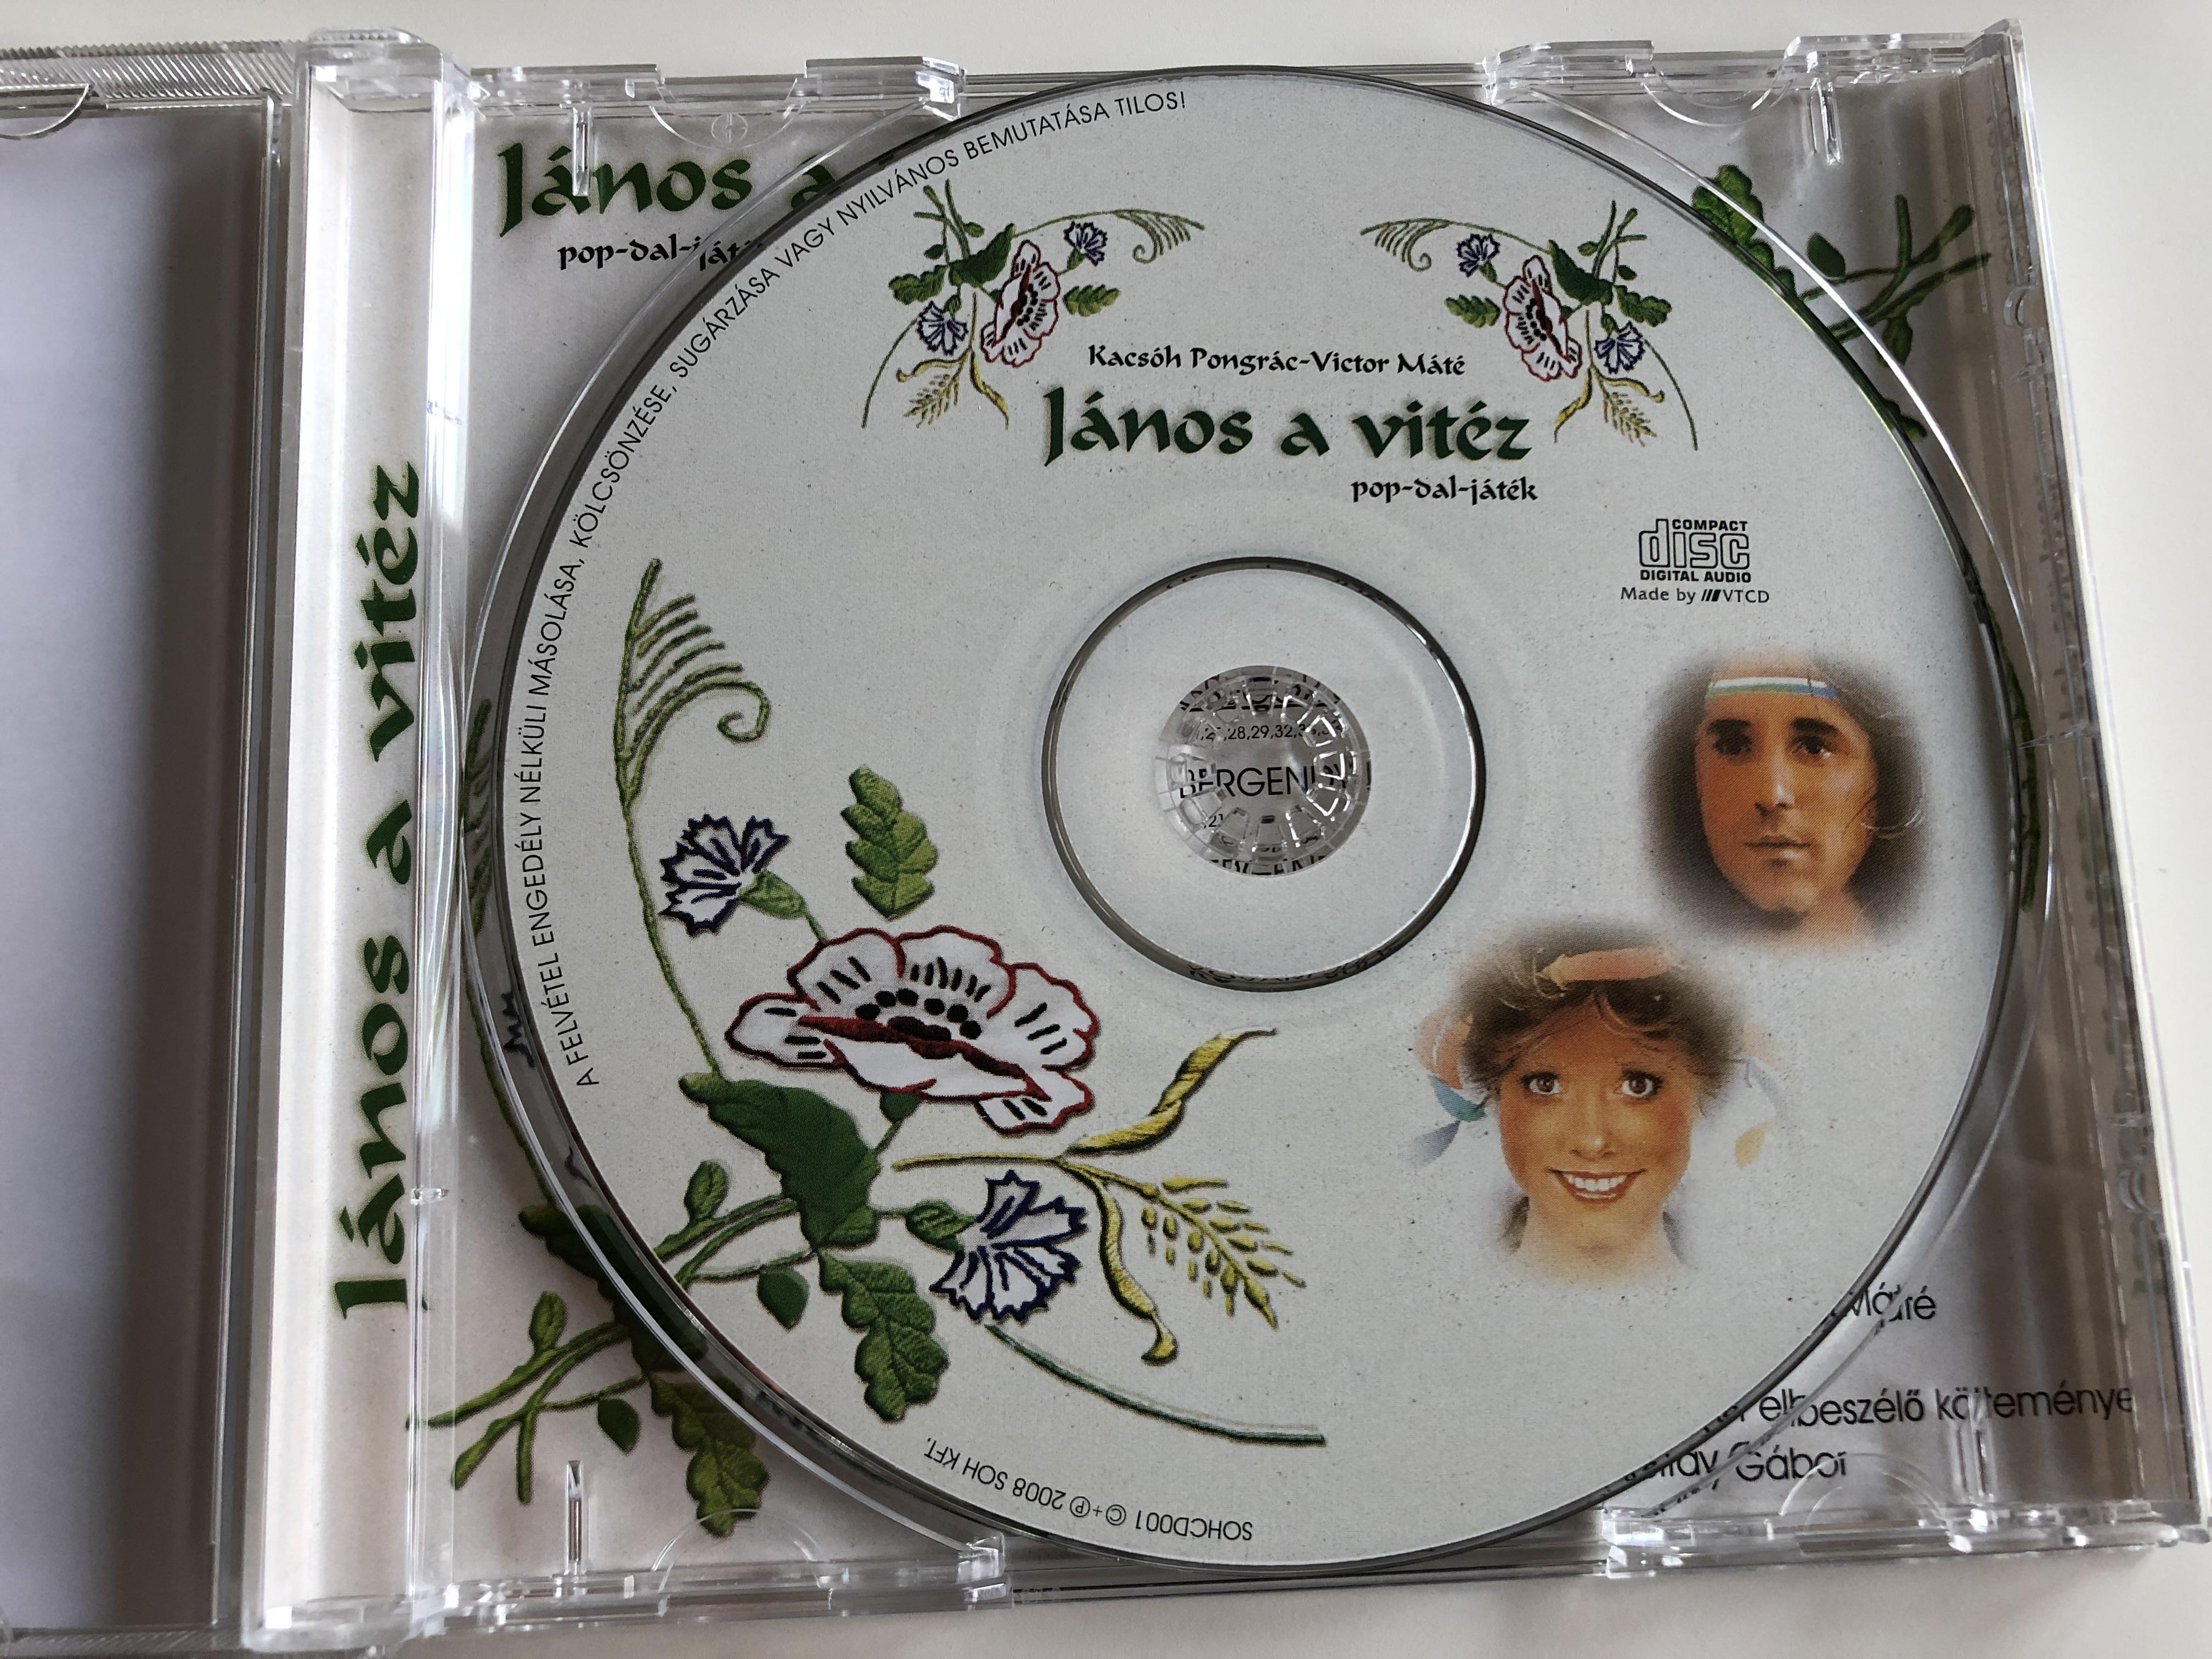 kacsoh-pongr-cz-victor-m-t-j-nos-a-vit-z-pop-dal-j-t-k-varga-mikl-s-katona-kl-ri-balogh-ferenc-szil-gyi-istv-n-de-k-bill-gyula-hern-di-judit-audio-cd-2008-szegedi-szabadt-ri-j-t-kok-1985-2-.jpg